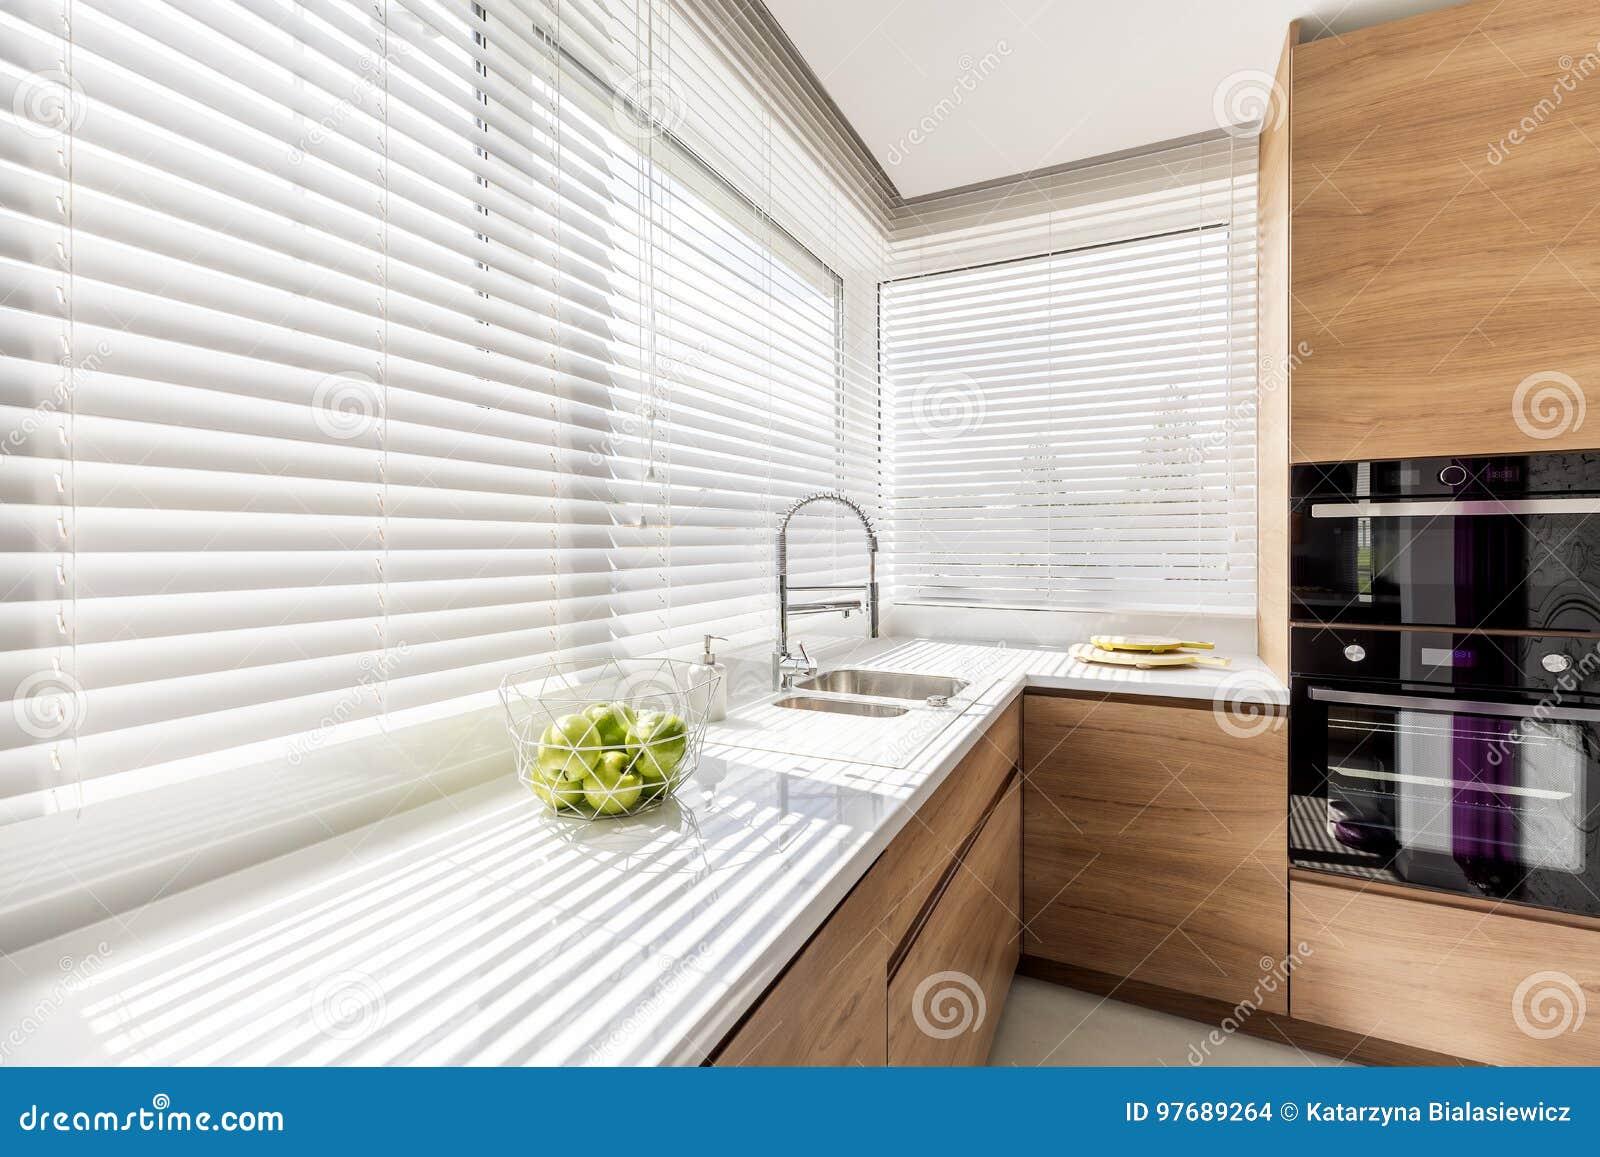 Cucina Con I Ciechi Di Finestra Bianchi Fotografia Stock - Immagine ...